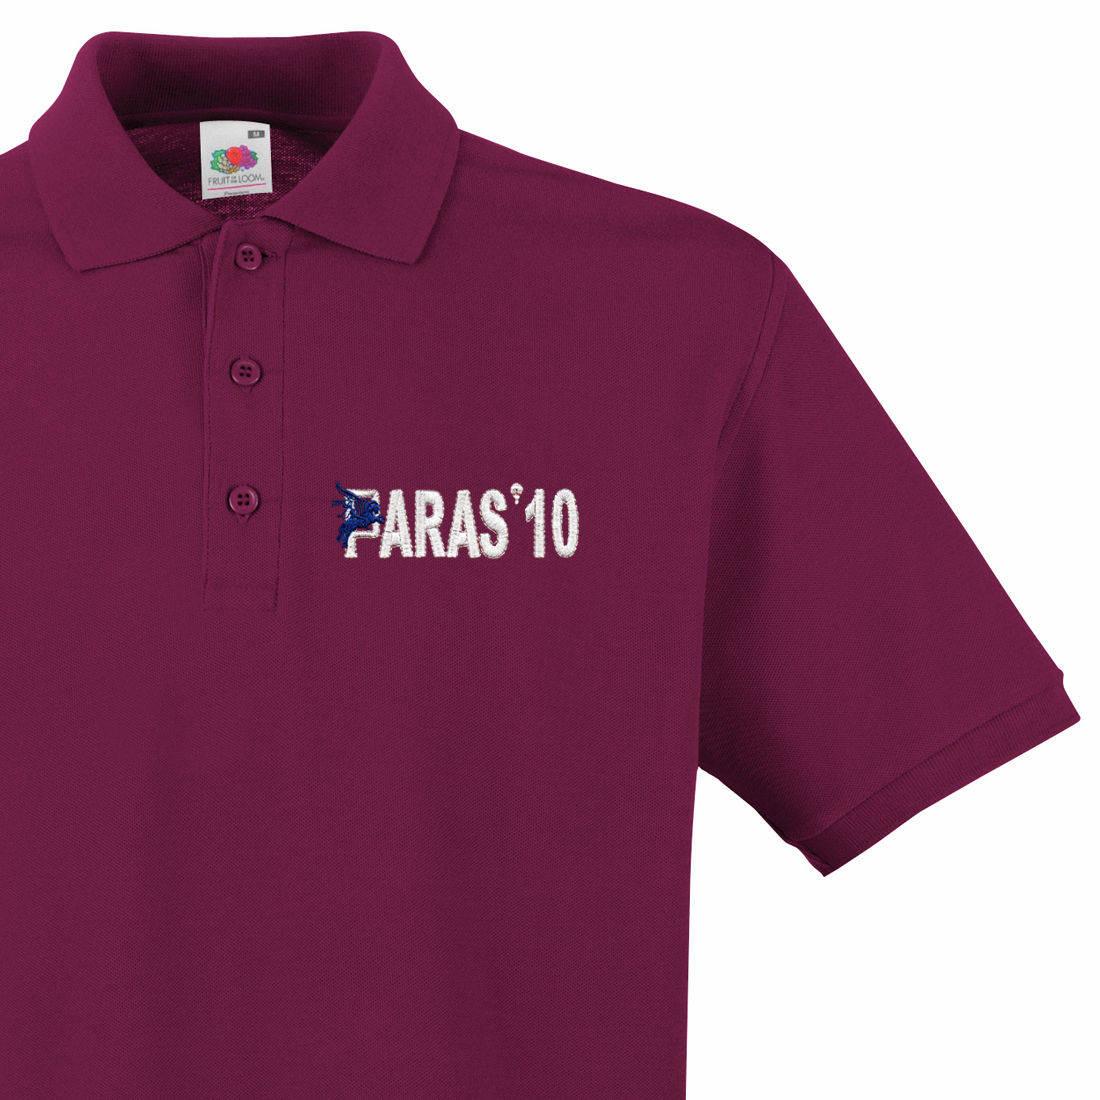 Polo Shirt - Maroon - Paras 10